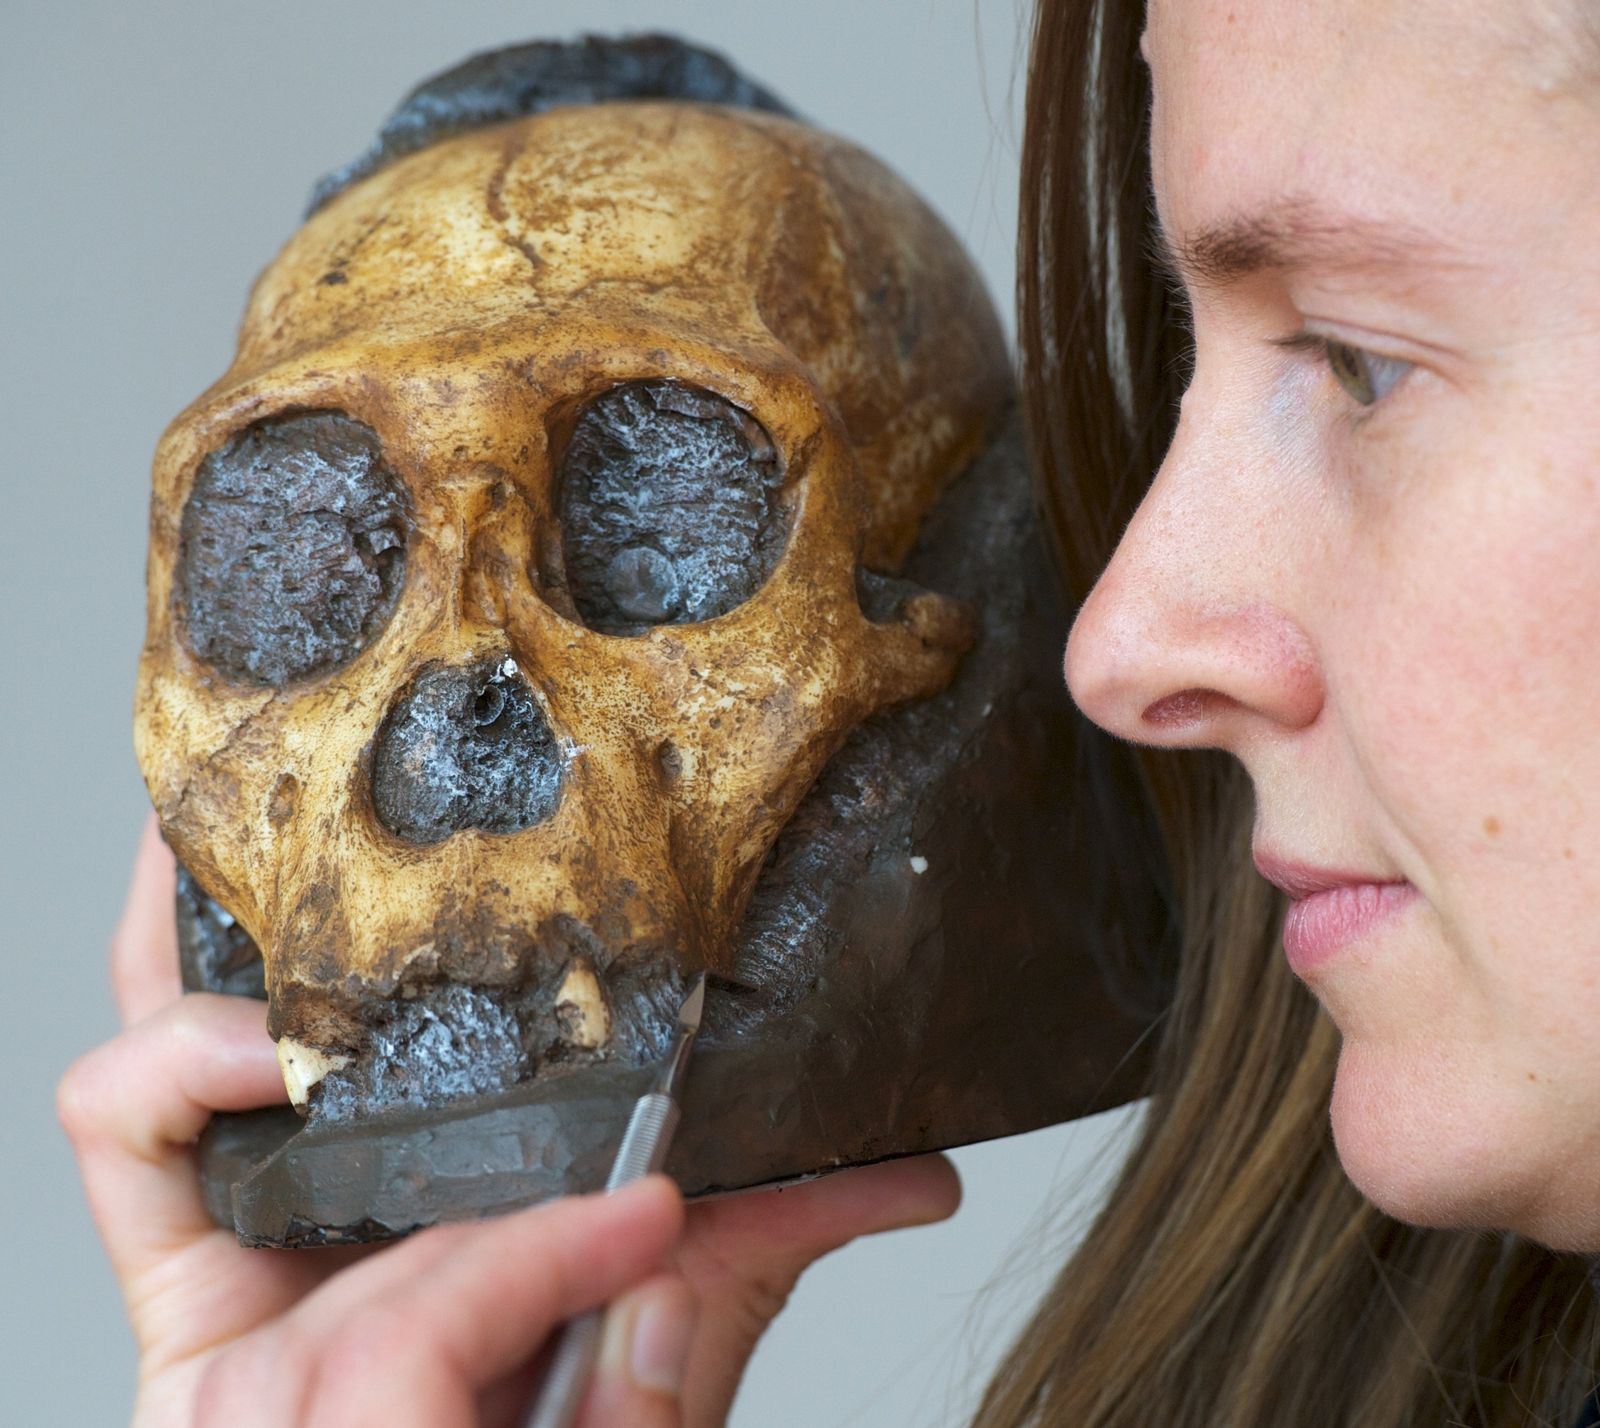 Der Australopithecus sediba aß Baumrinde